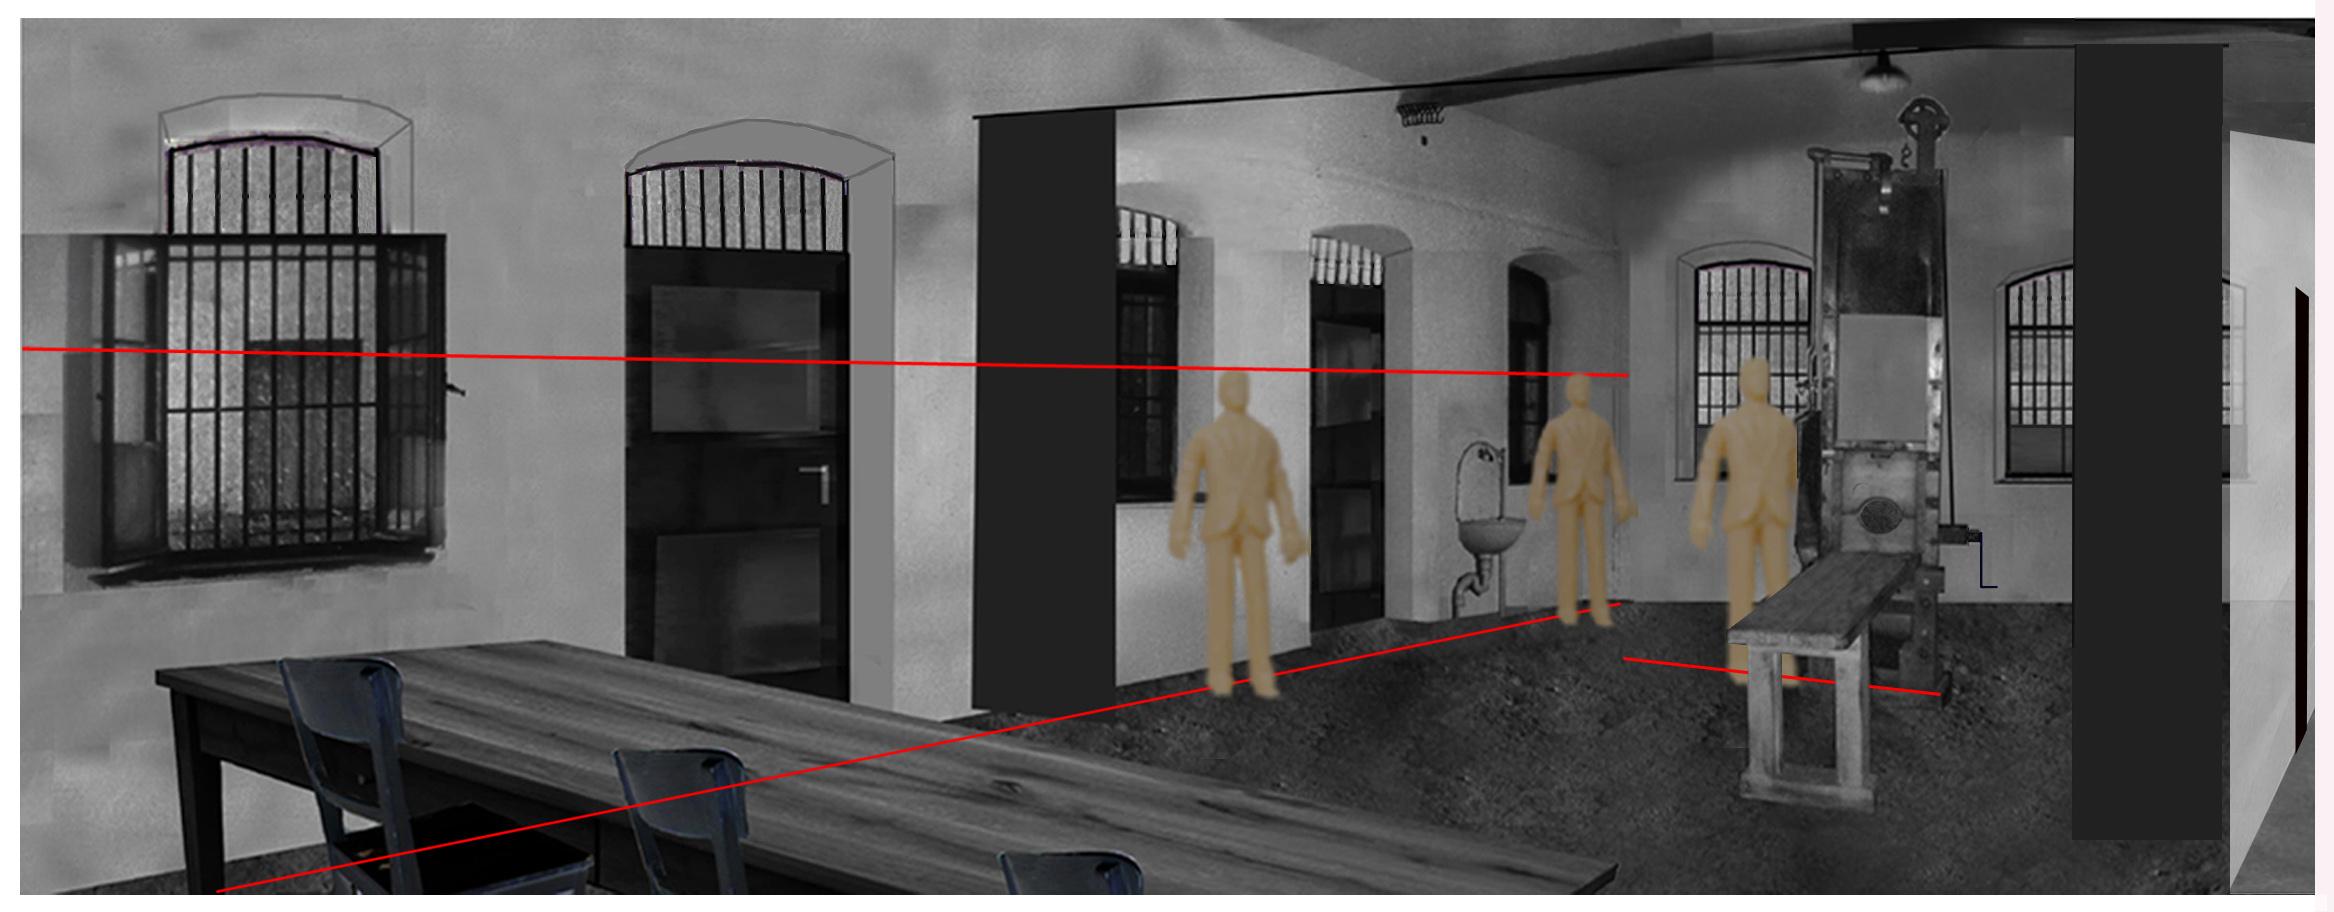 White-Rose-execution-room-site-fallbei-beheadings-room-panoramic-black -curtain-garage-Weisse-Rose-Scholl-Probst-Huber-Schmorell-Graf-Stadelheim-Muenchen-München-Hinrichtungsraum-Fallbeil-1943-1958-Panorama